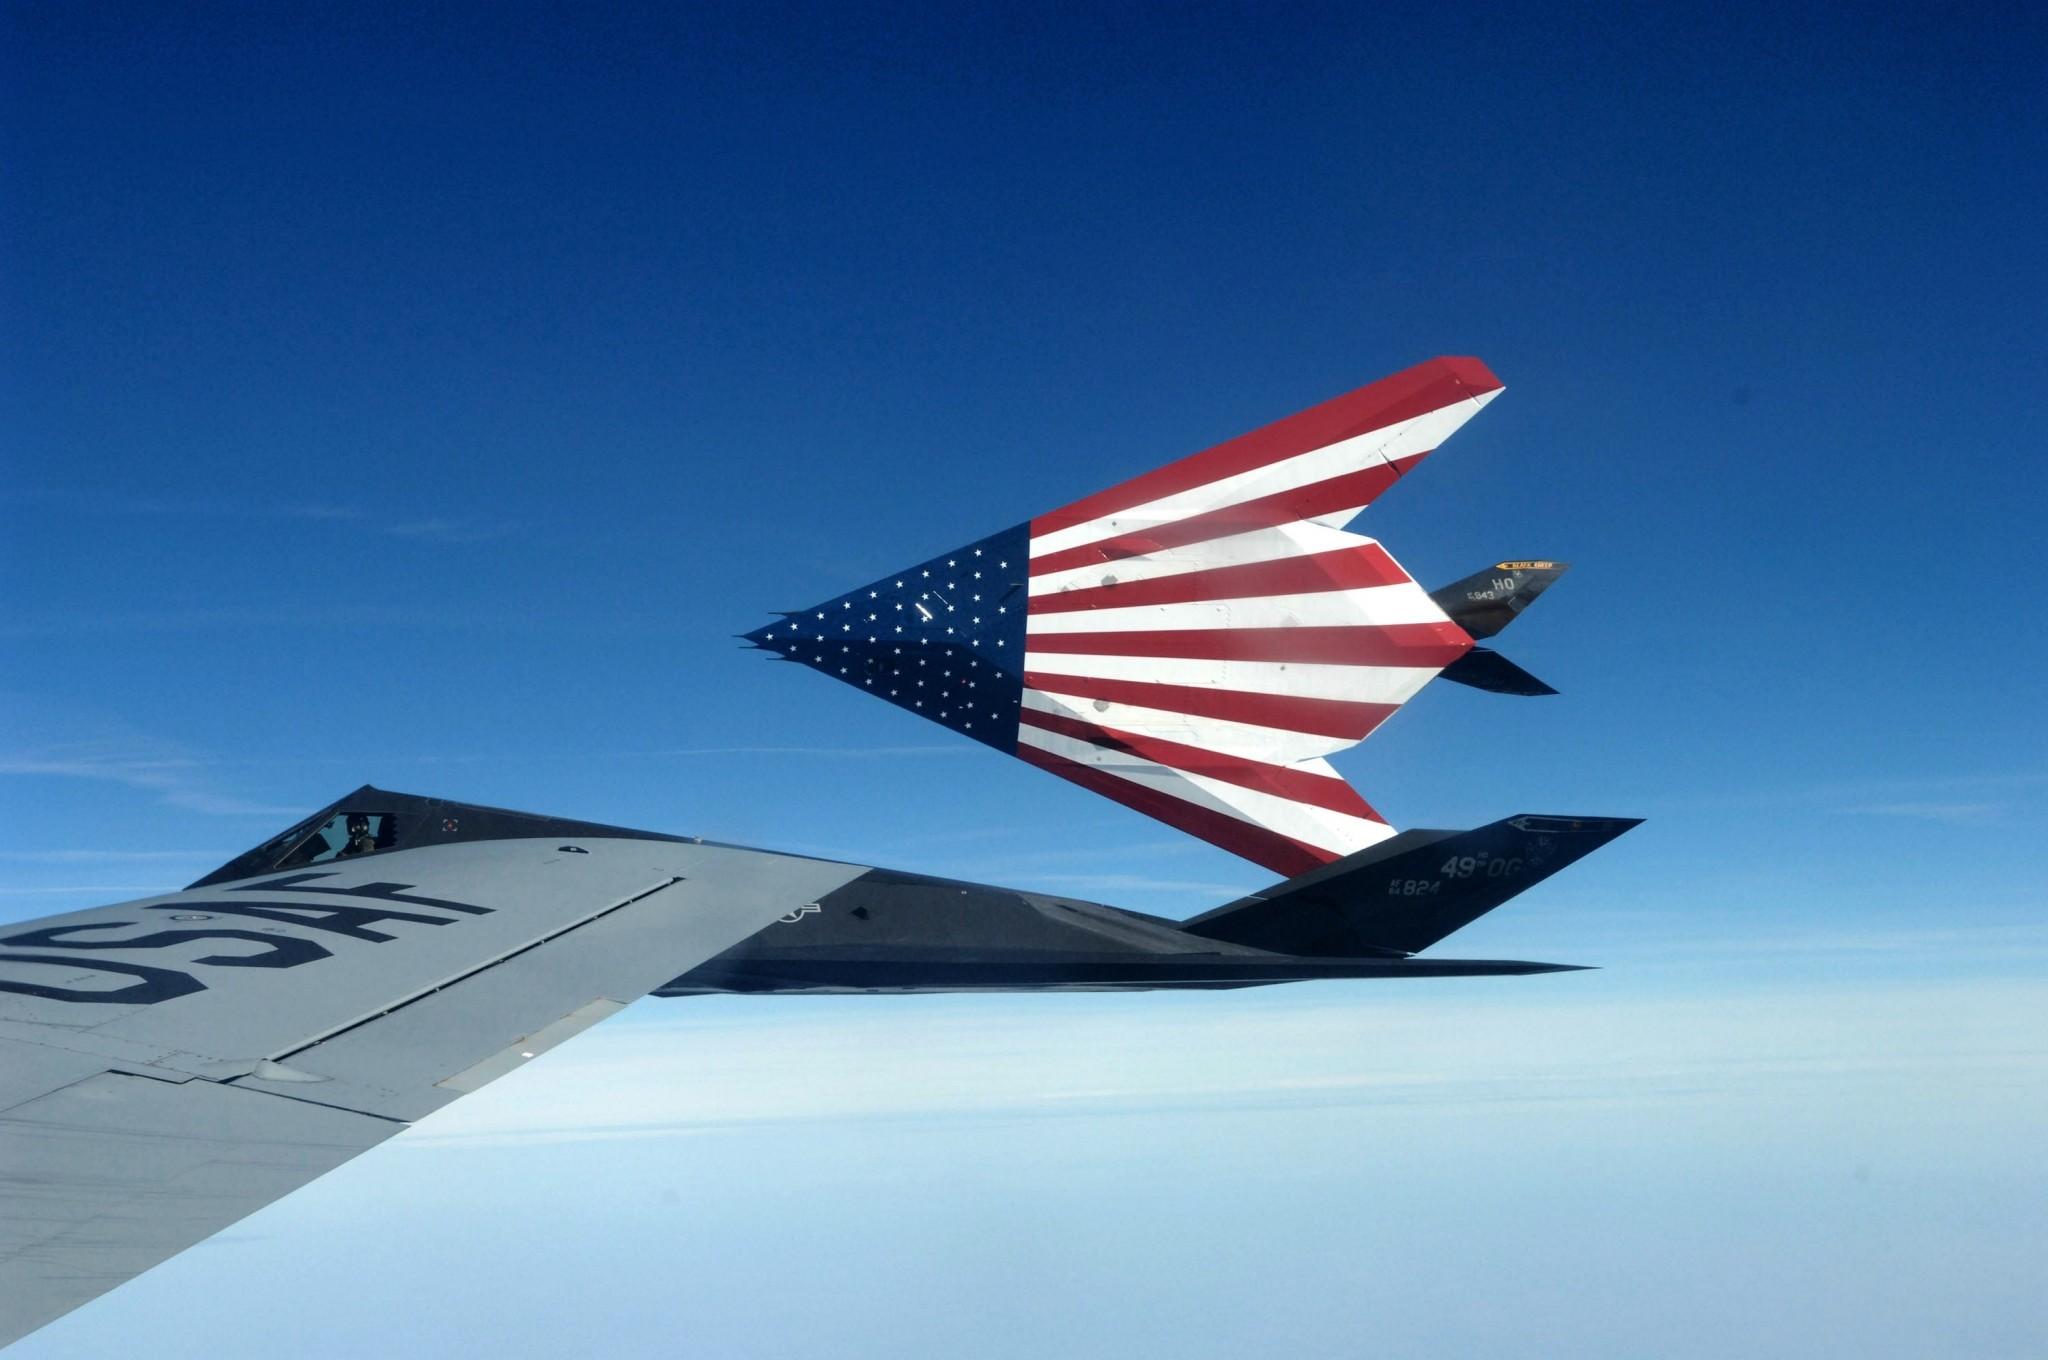 american flag wallpaper photos free